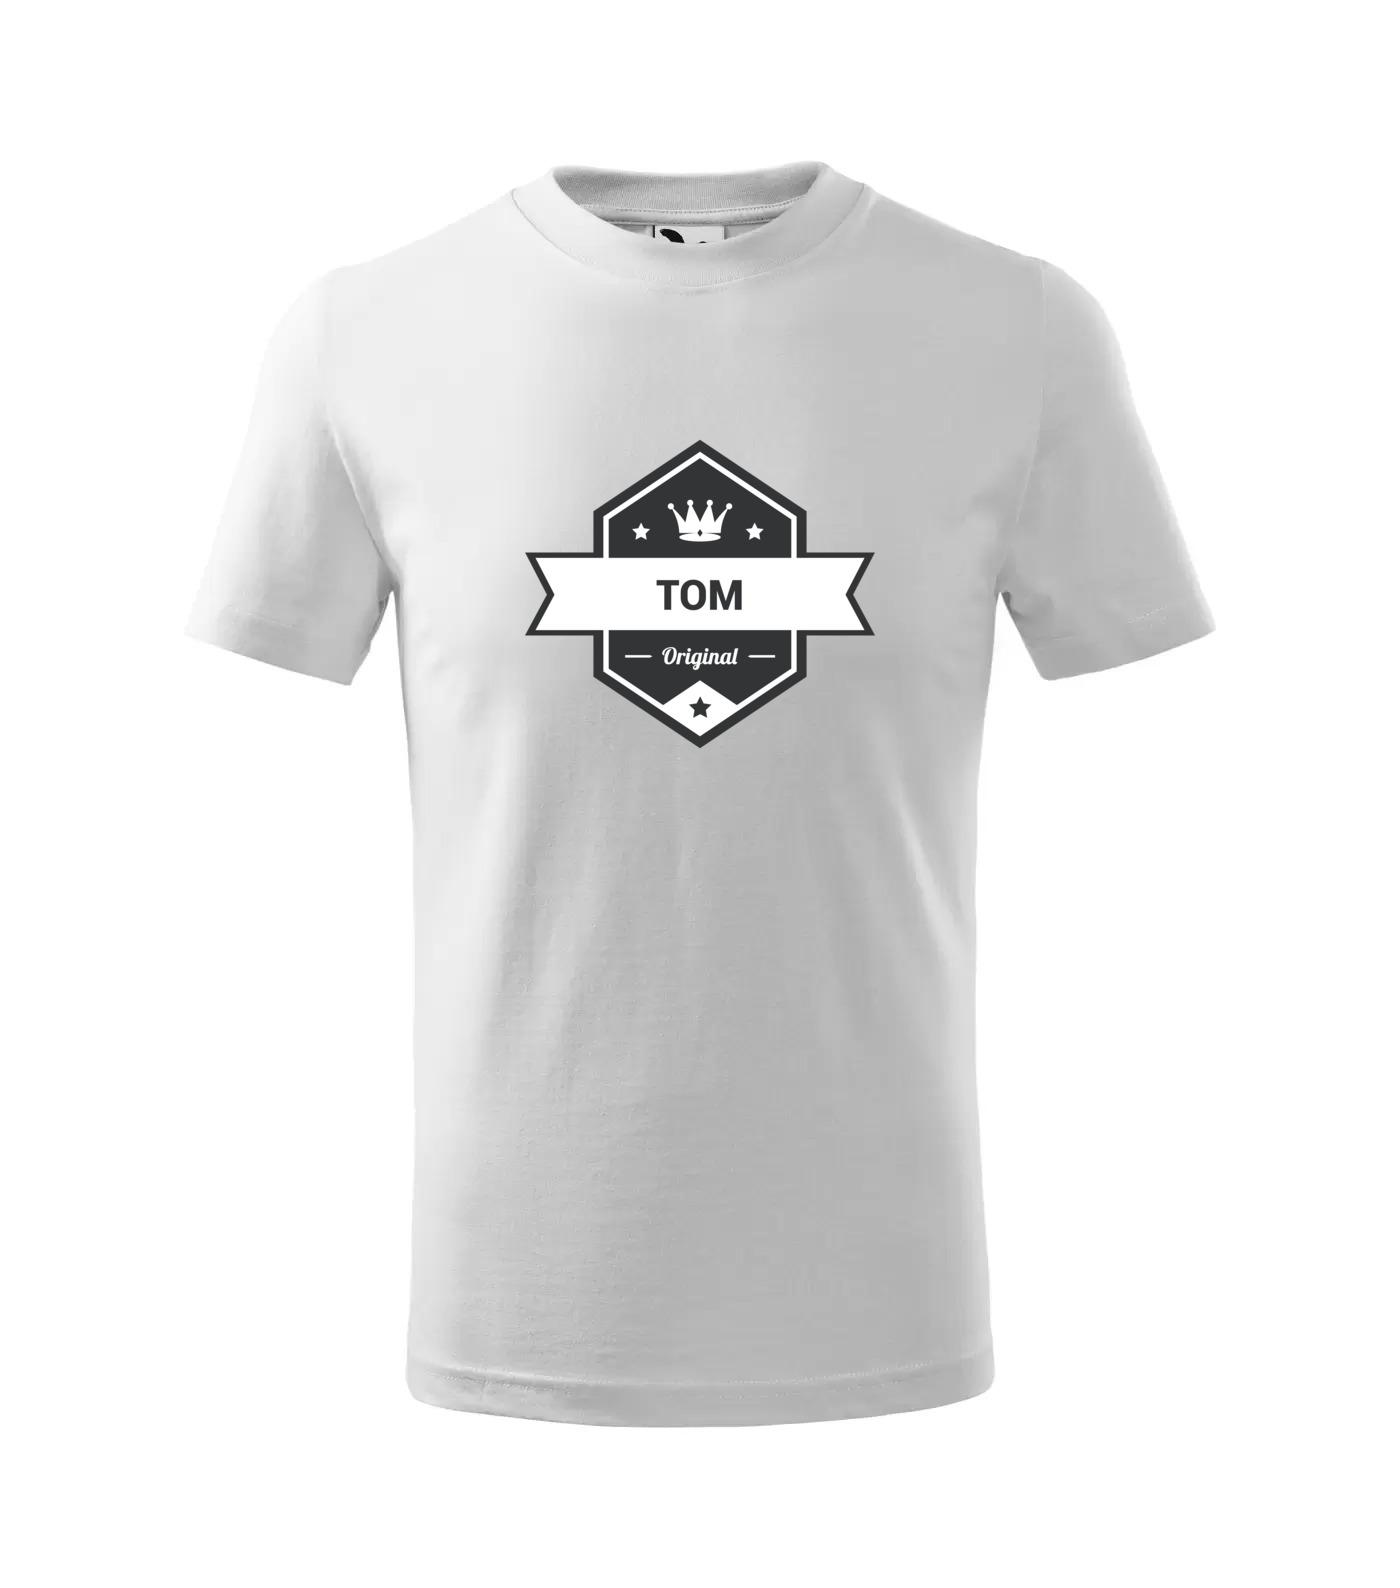 Tričko King Tom